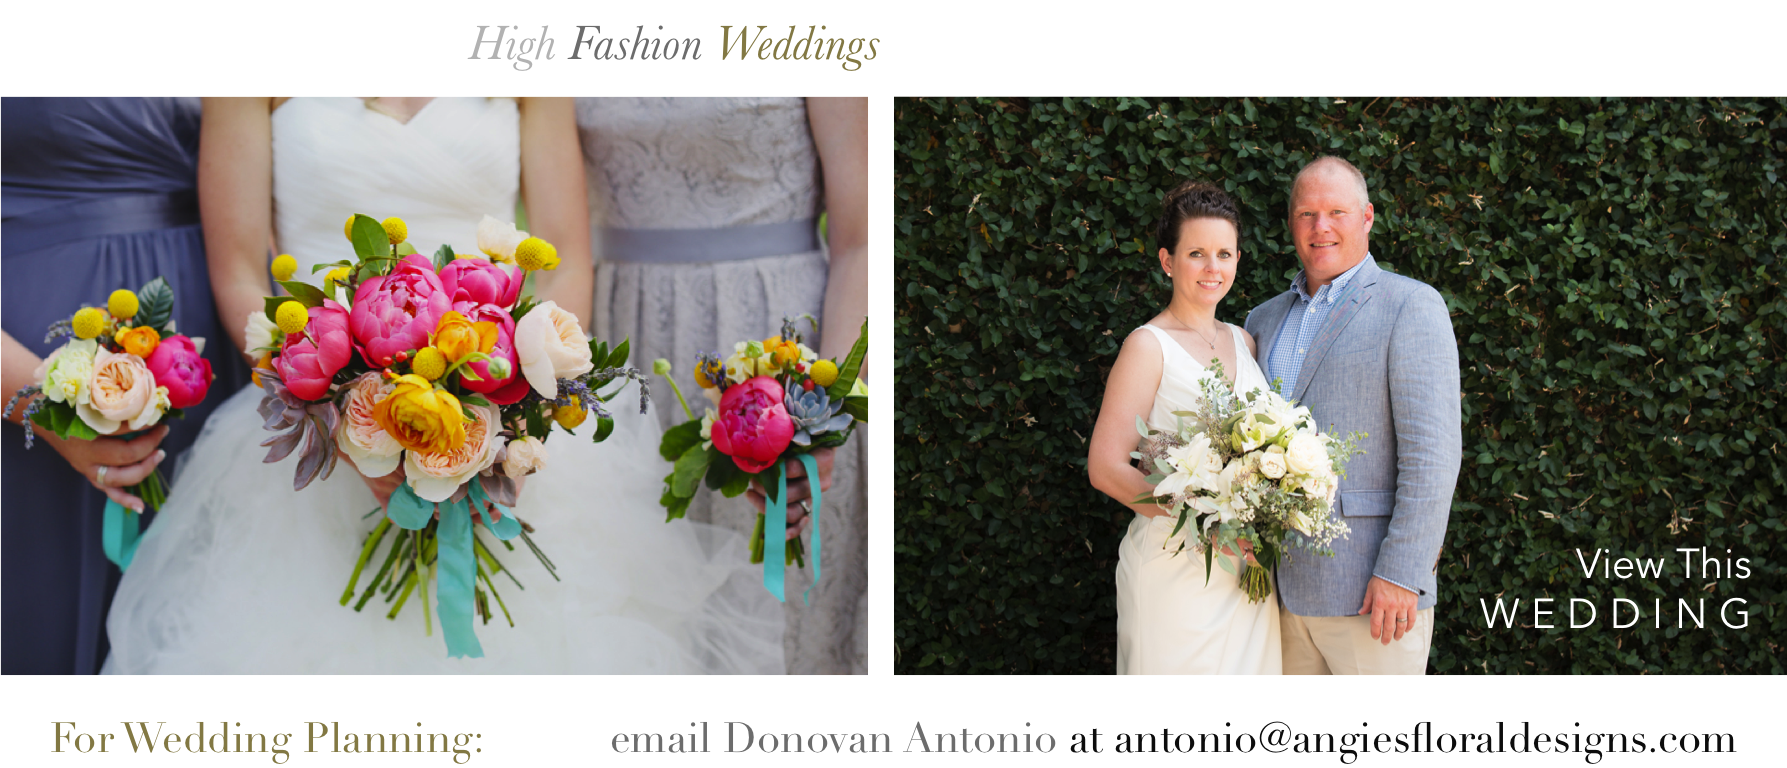 -.-a-gi-e-weddings-bodas-el-paso-florist-flowers-l-angies-flowers-angie-s-floral-designs-el-paso-business-accounts-floral-designs-plants-gifts-shopflores-online-el-paso-texas-florist-flower-delivery-weddings-events-79912.png